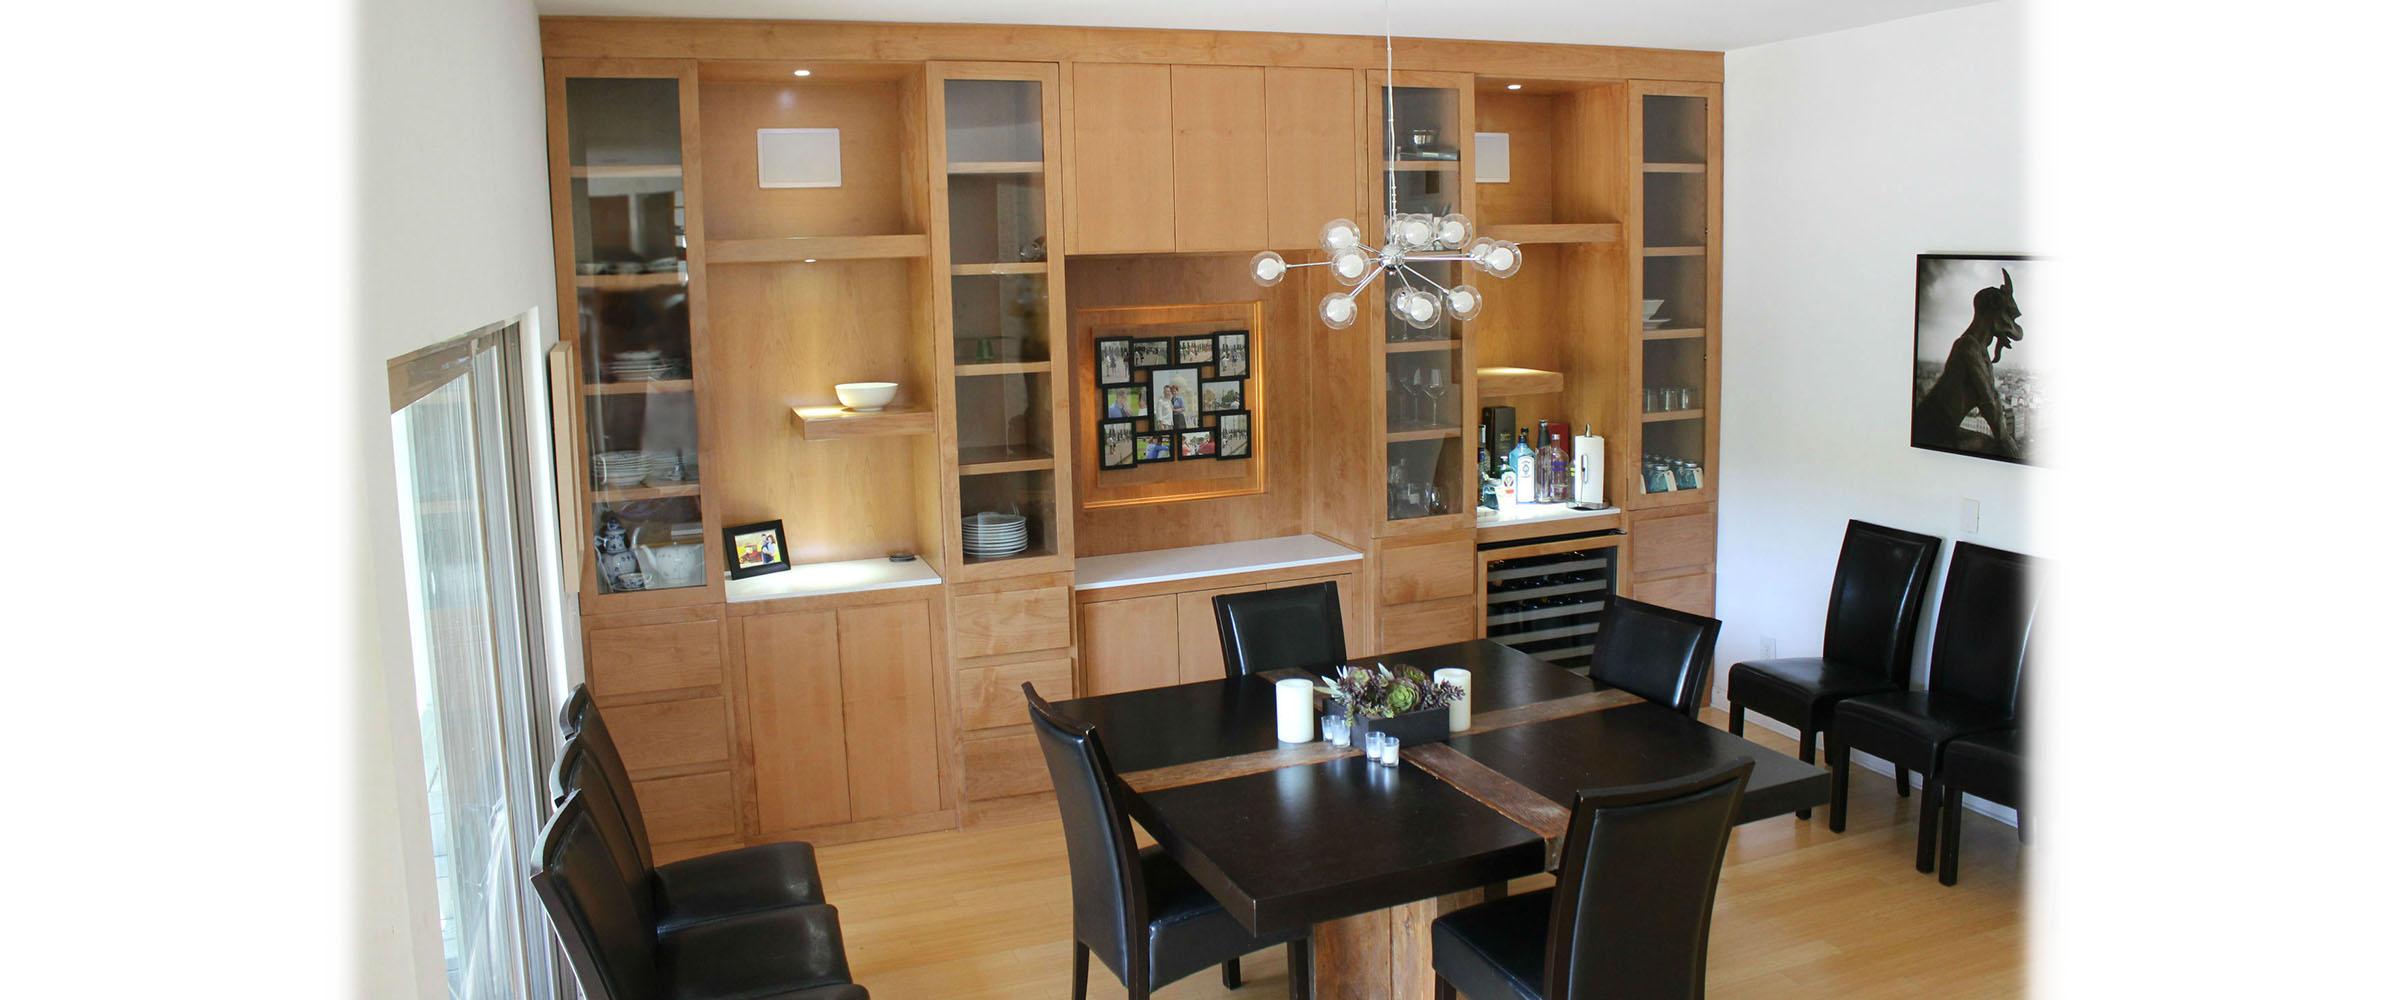 Wall slider closed creative home engineering - Creative home engineering ...